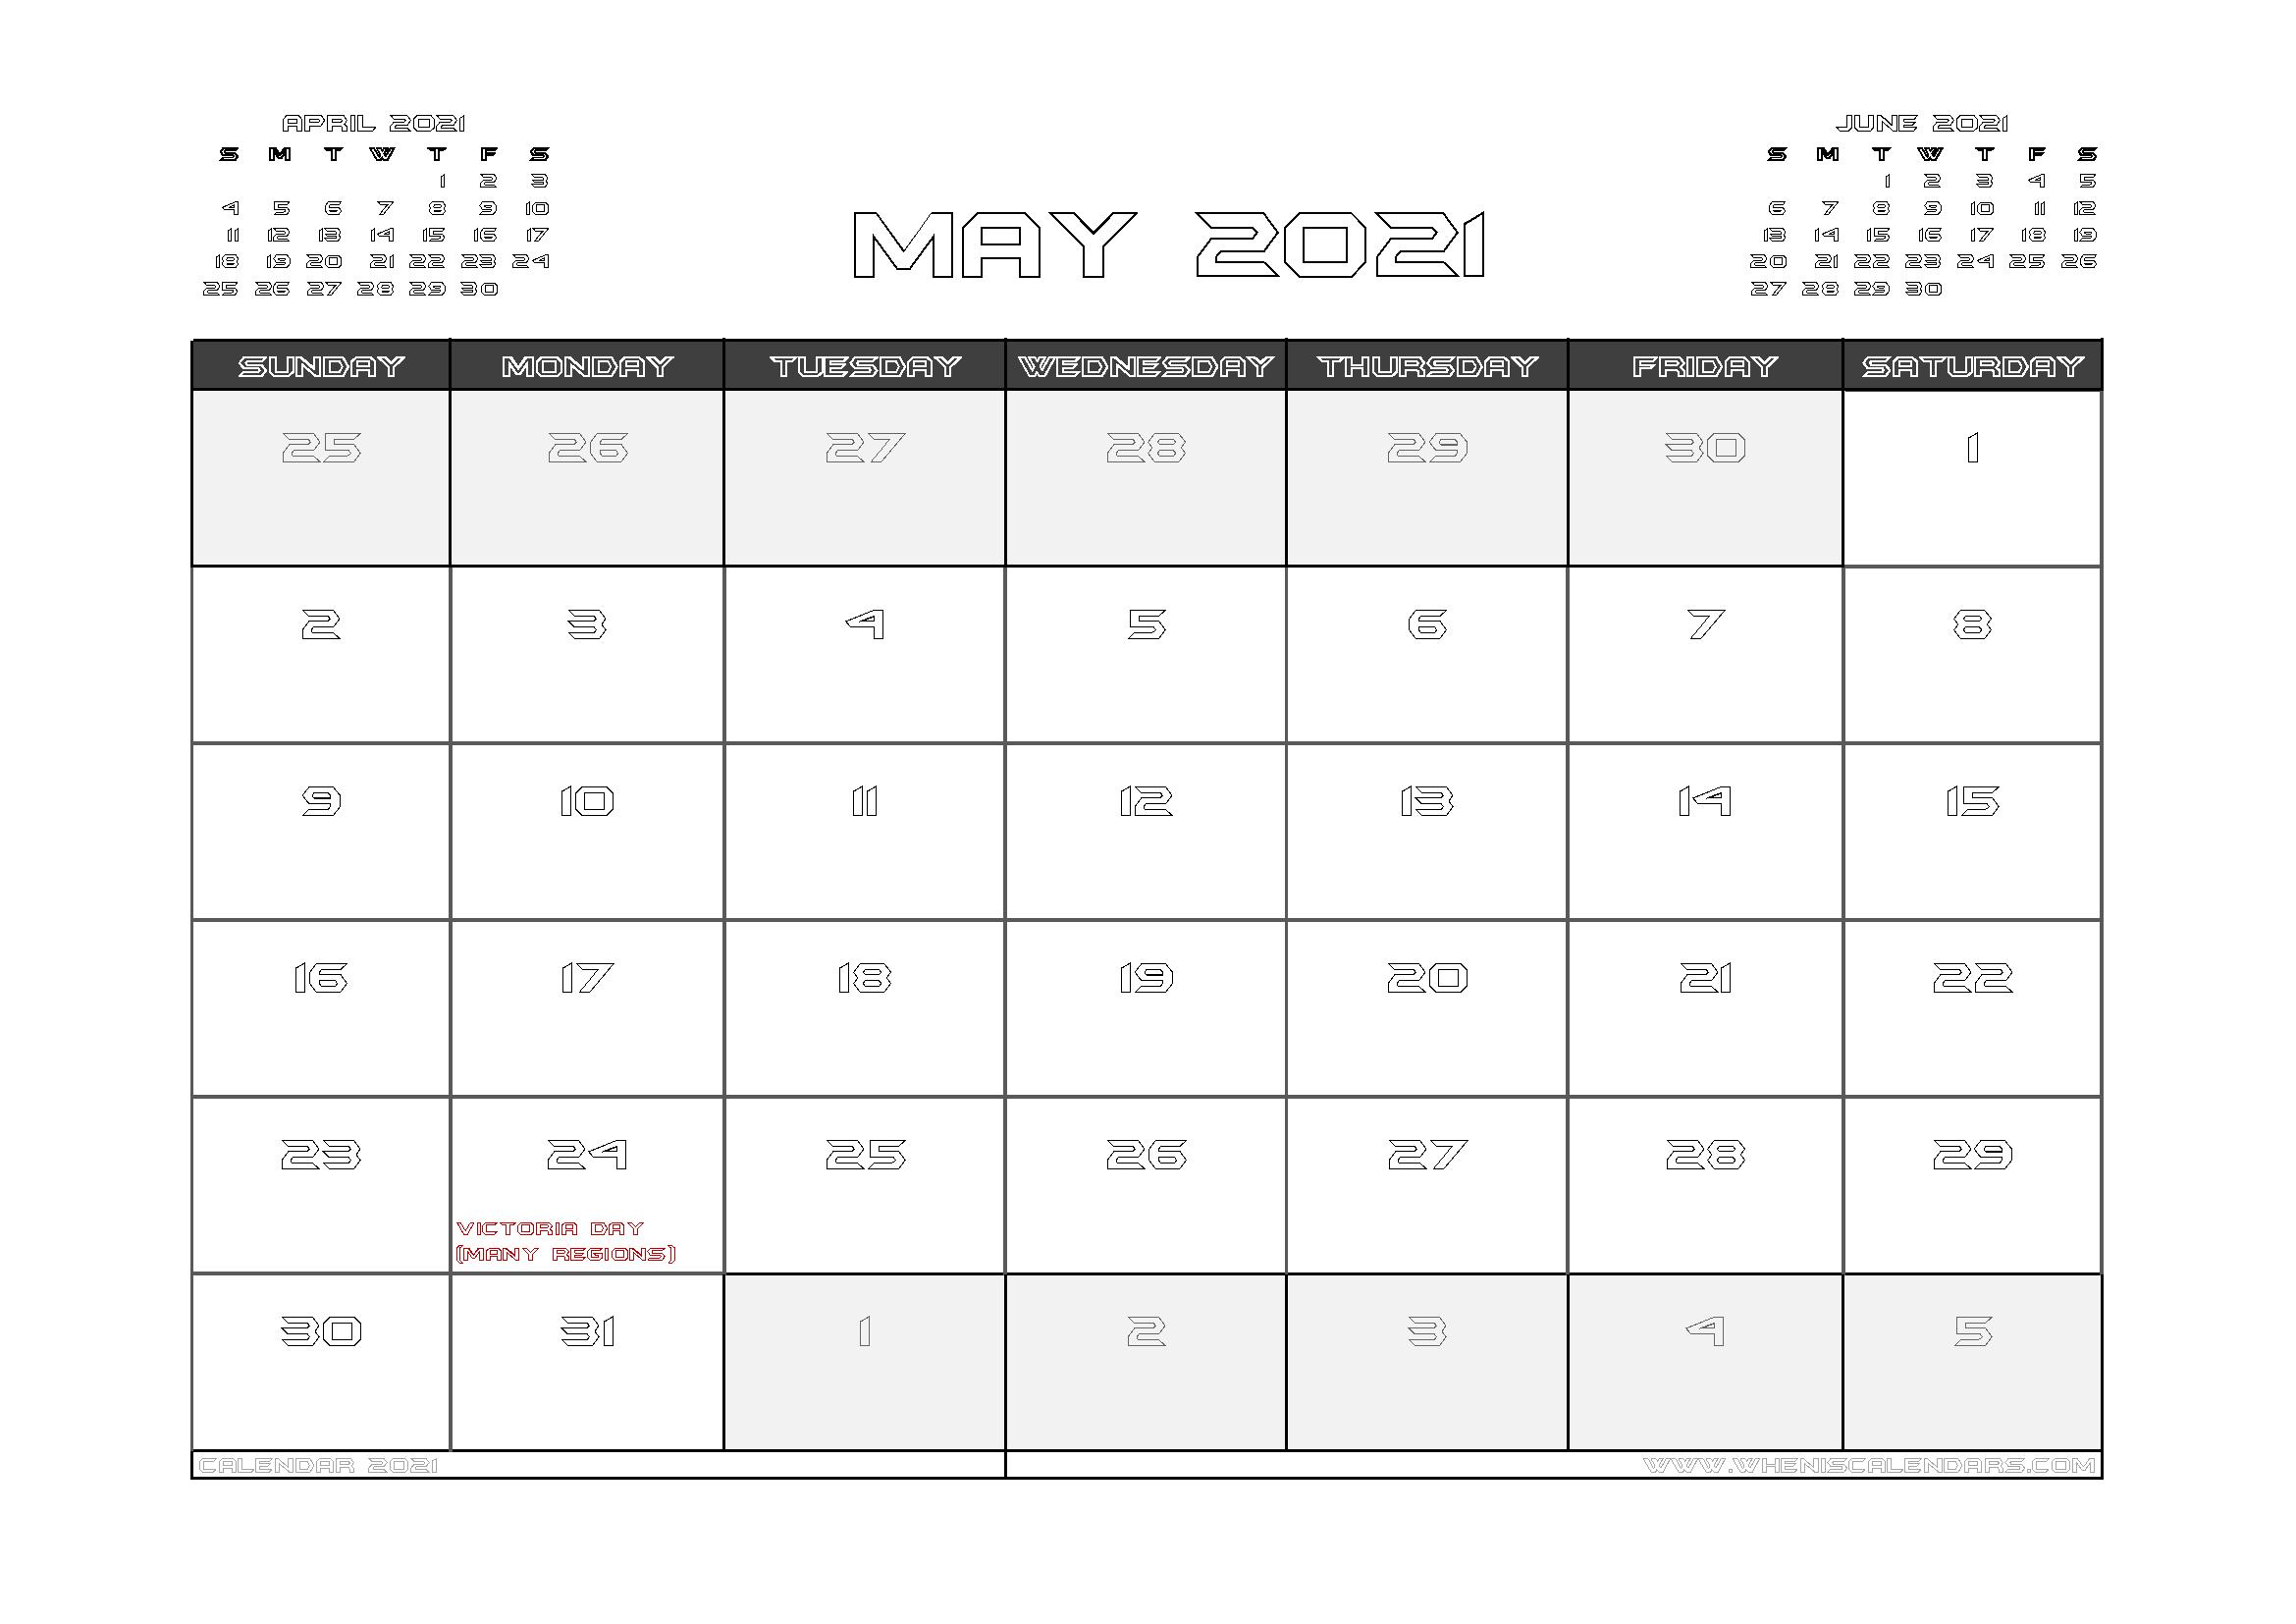 May 2021 Calendar Canada with Holidays